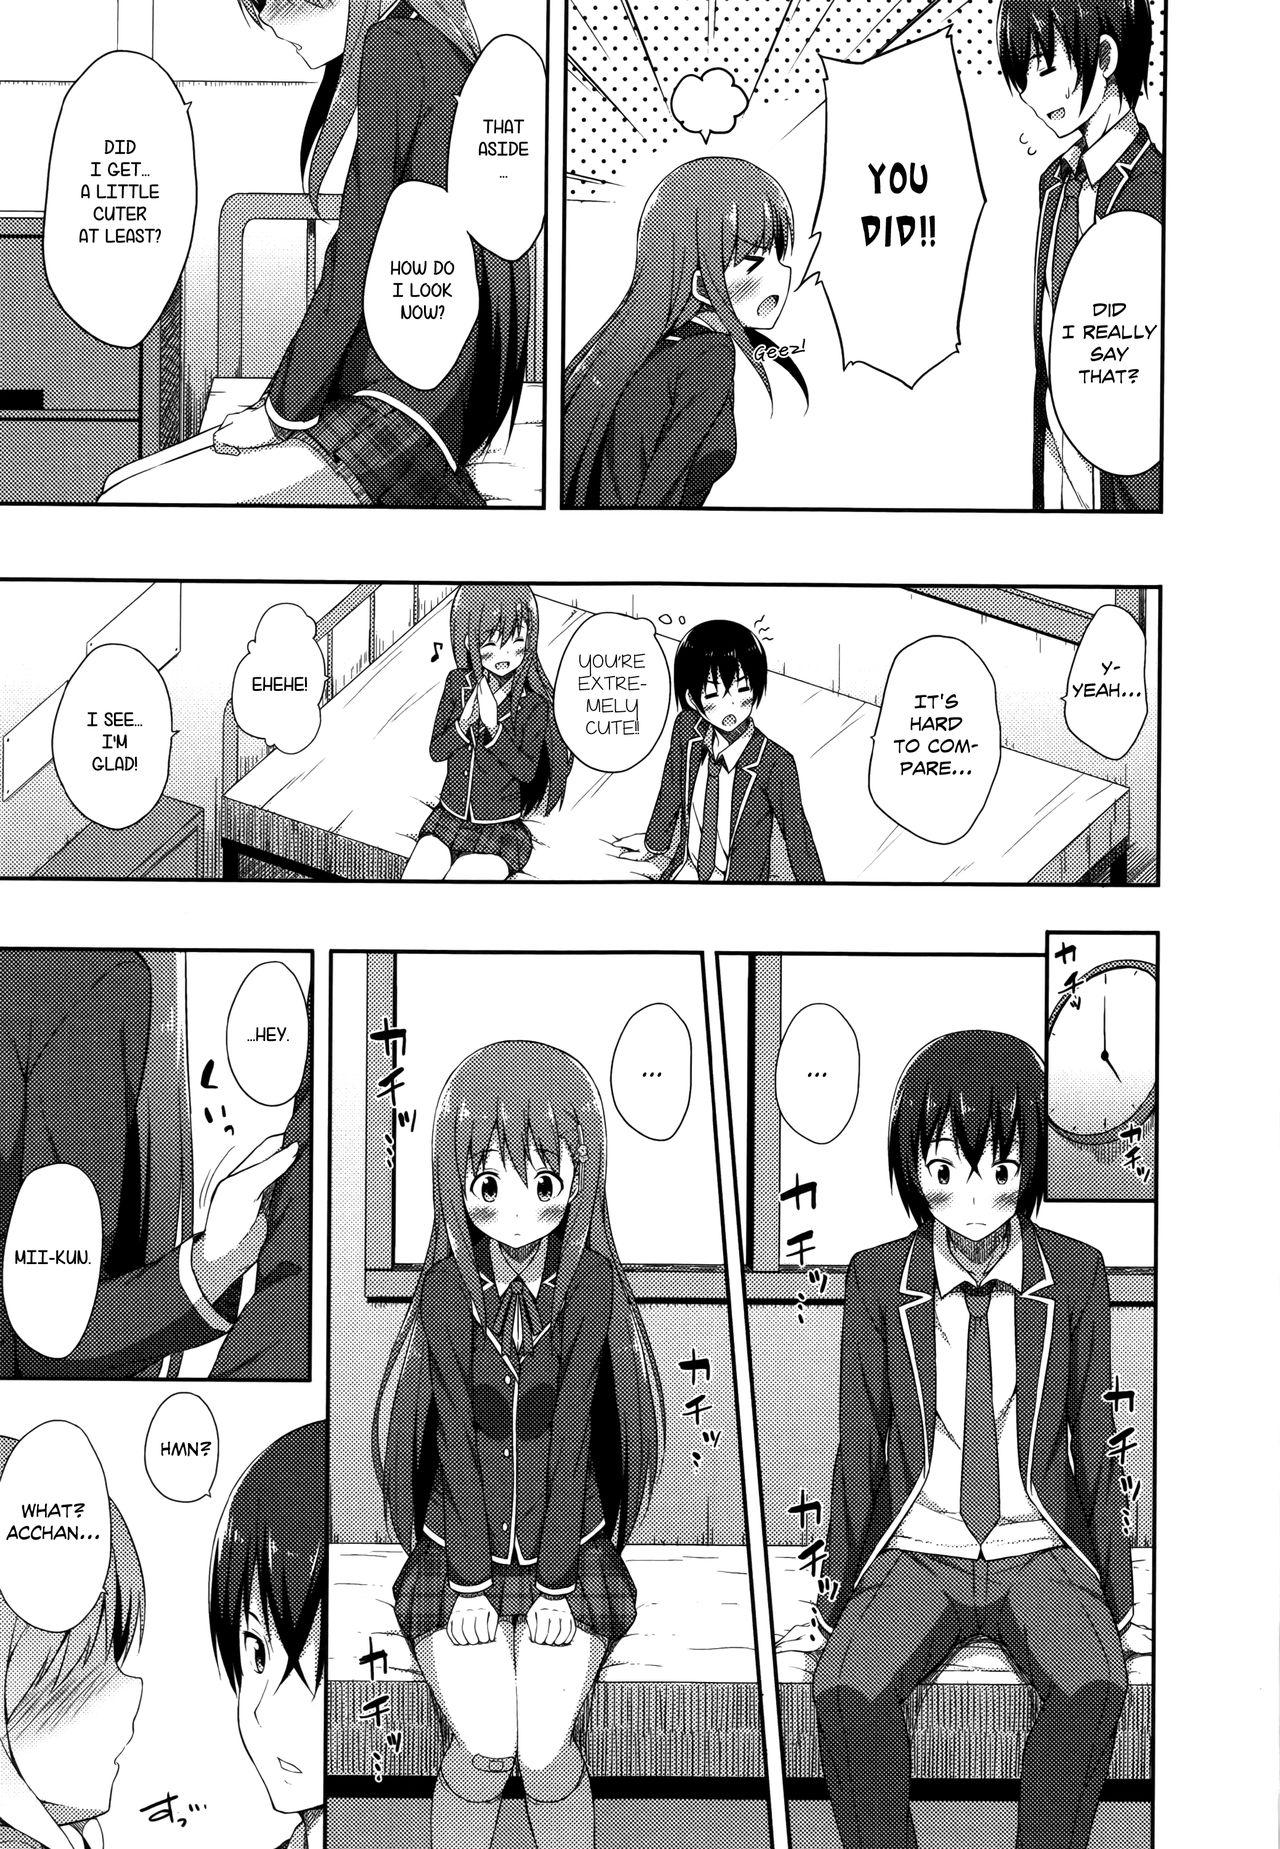 Kimi ga Haramu made Nando mo Aishiteru | I'll love you many times until you get pregnant 181